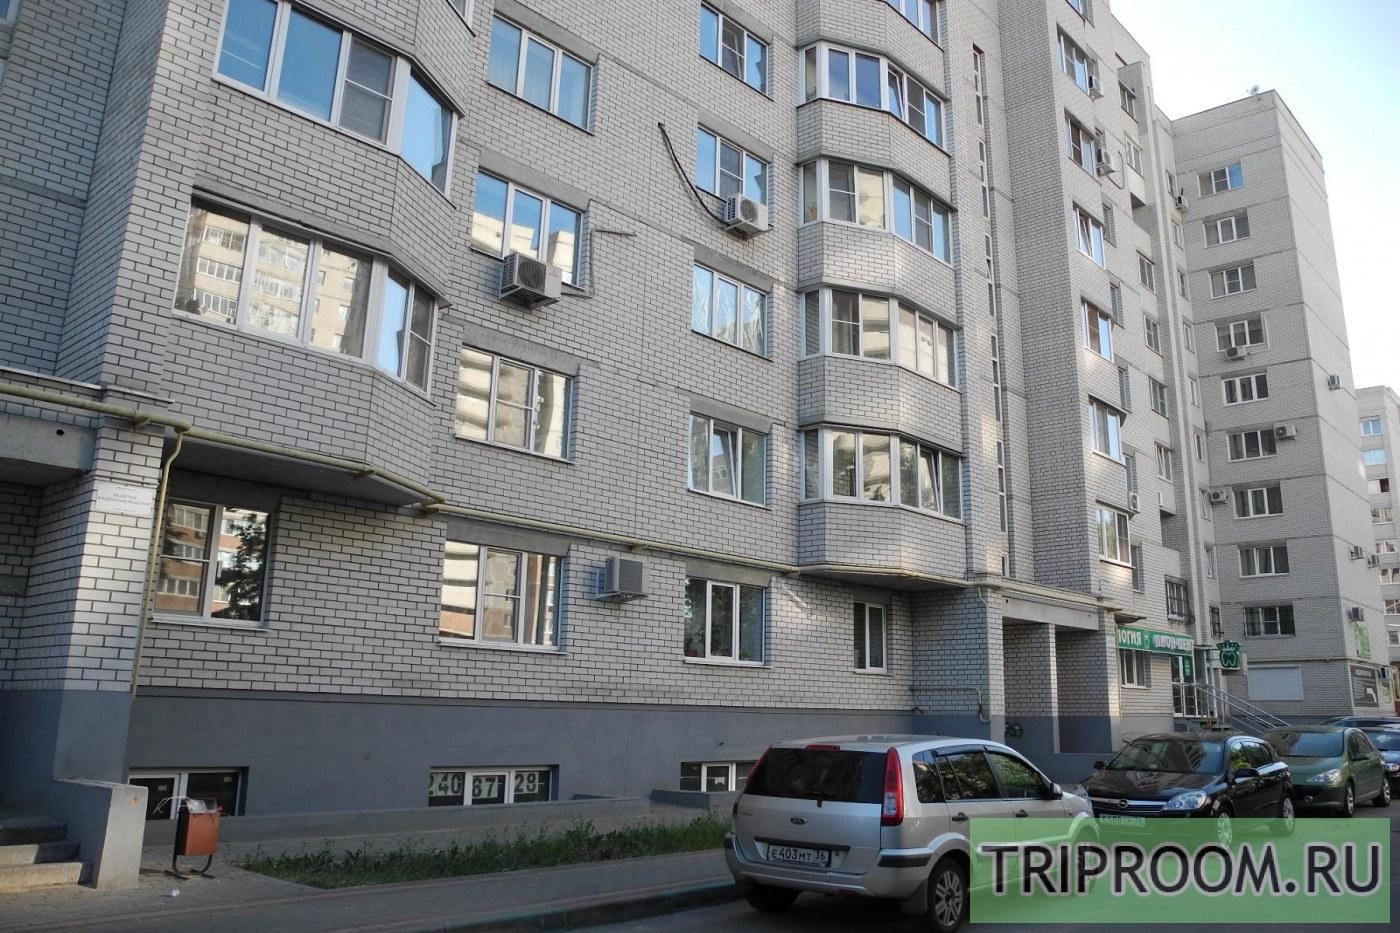 2-комнатная квартира посуточно (вариант № 3876), ул. Войкова улица, фото № 15